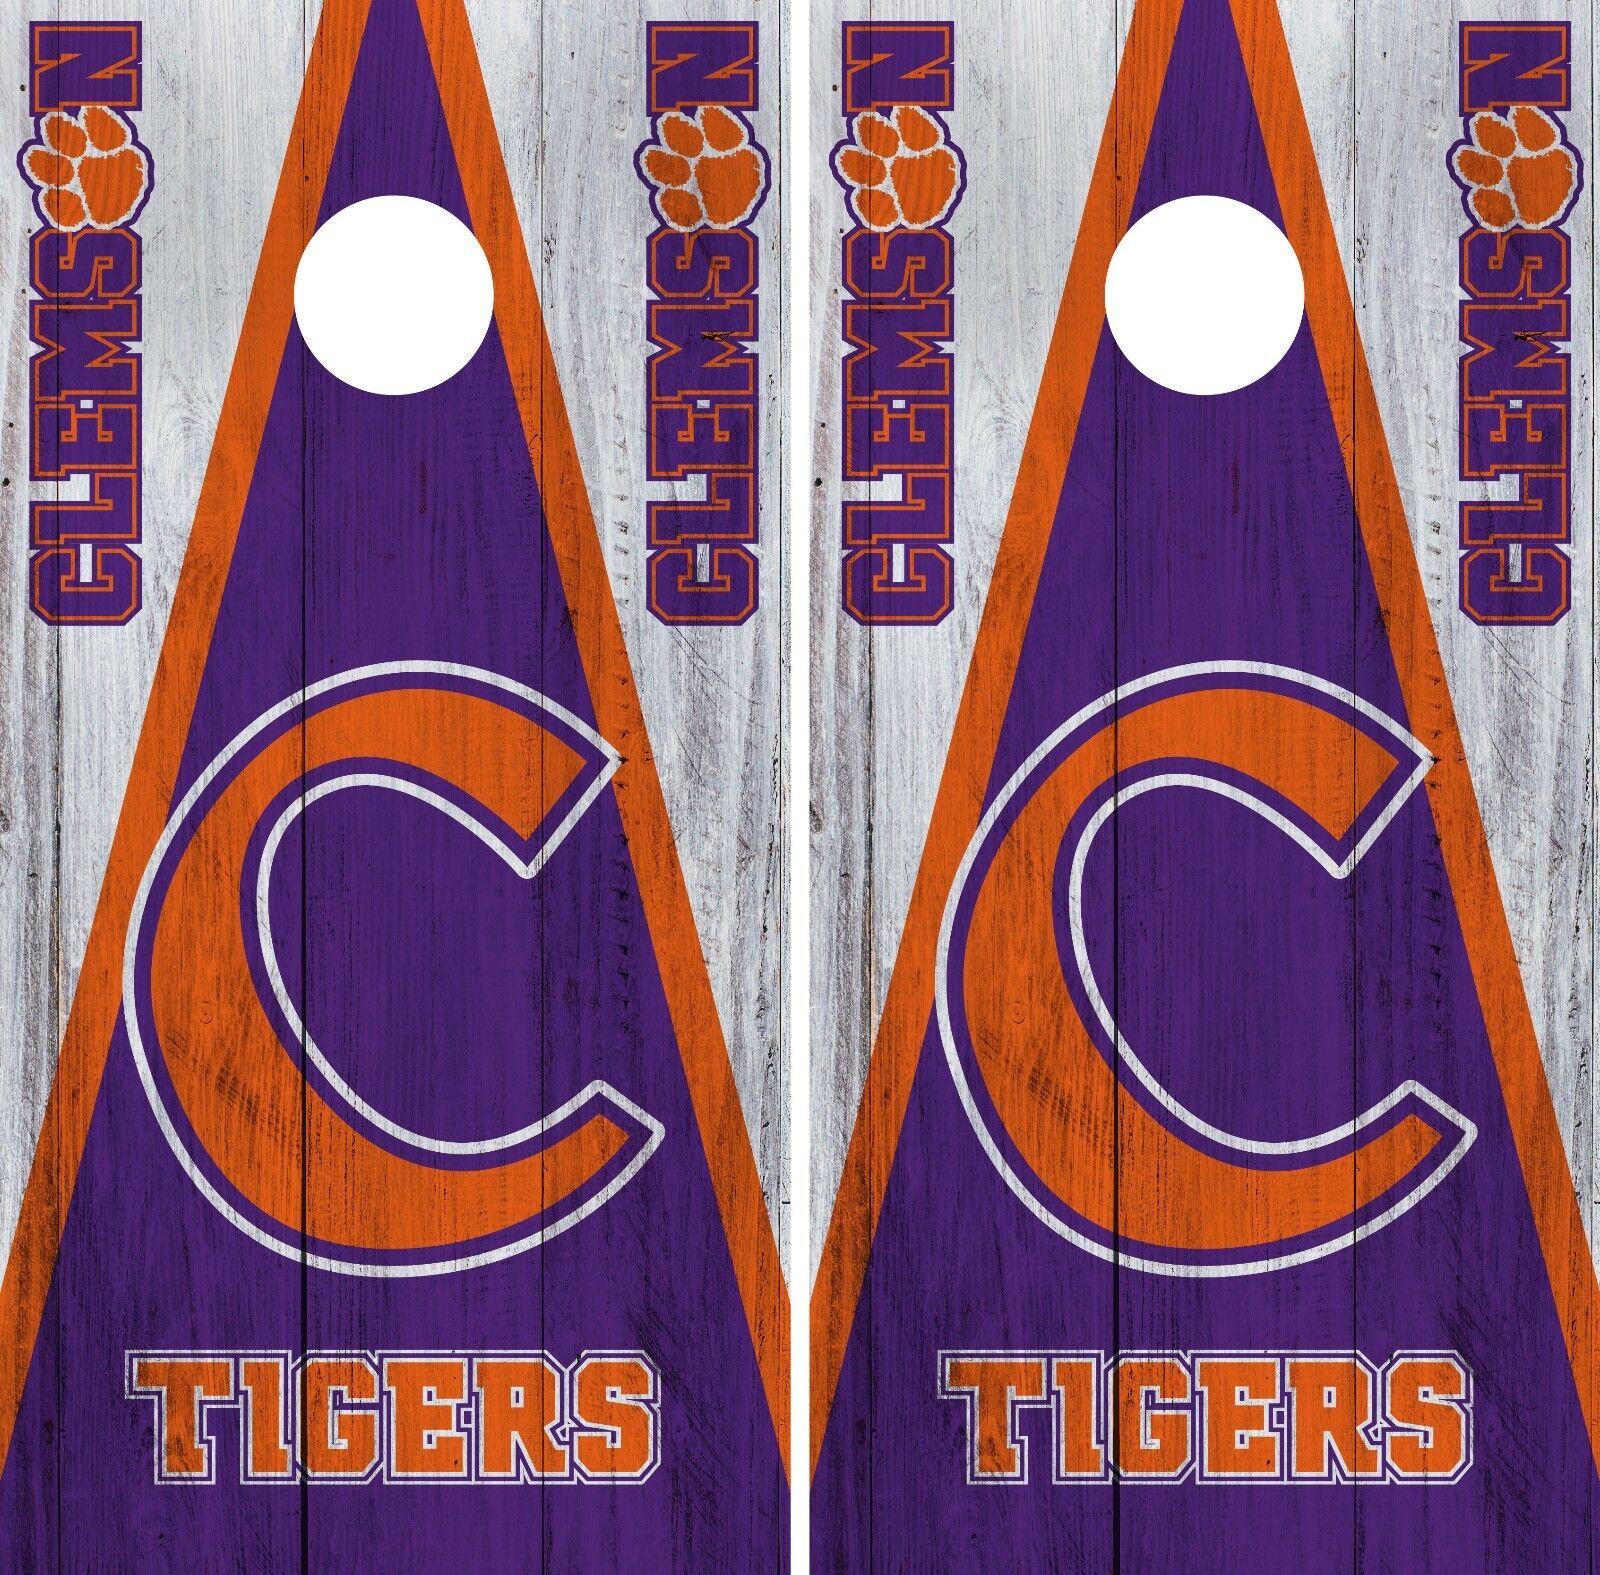 Clemson Tigers Cornhole Wrap NCAA College Game Board Skin Vinyl Decal Set CO755